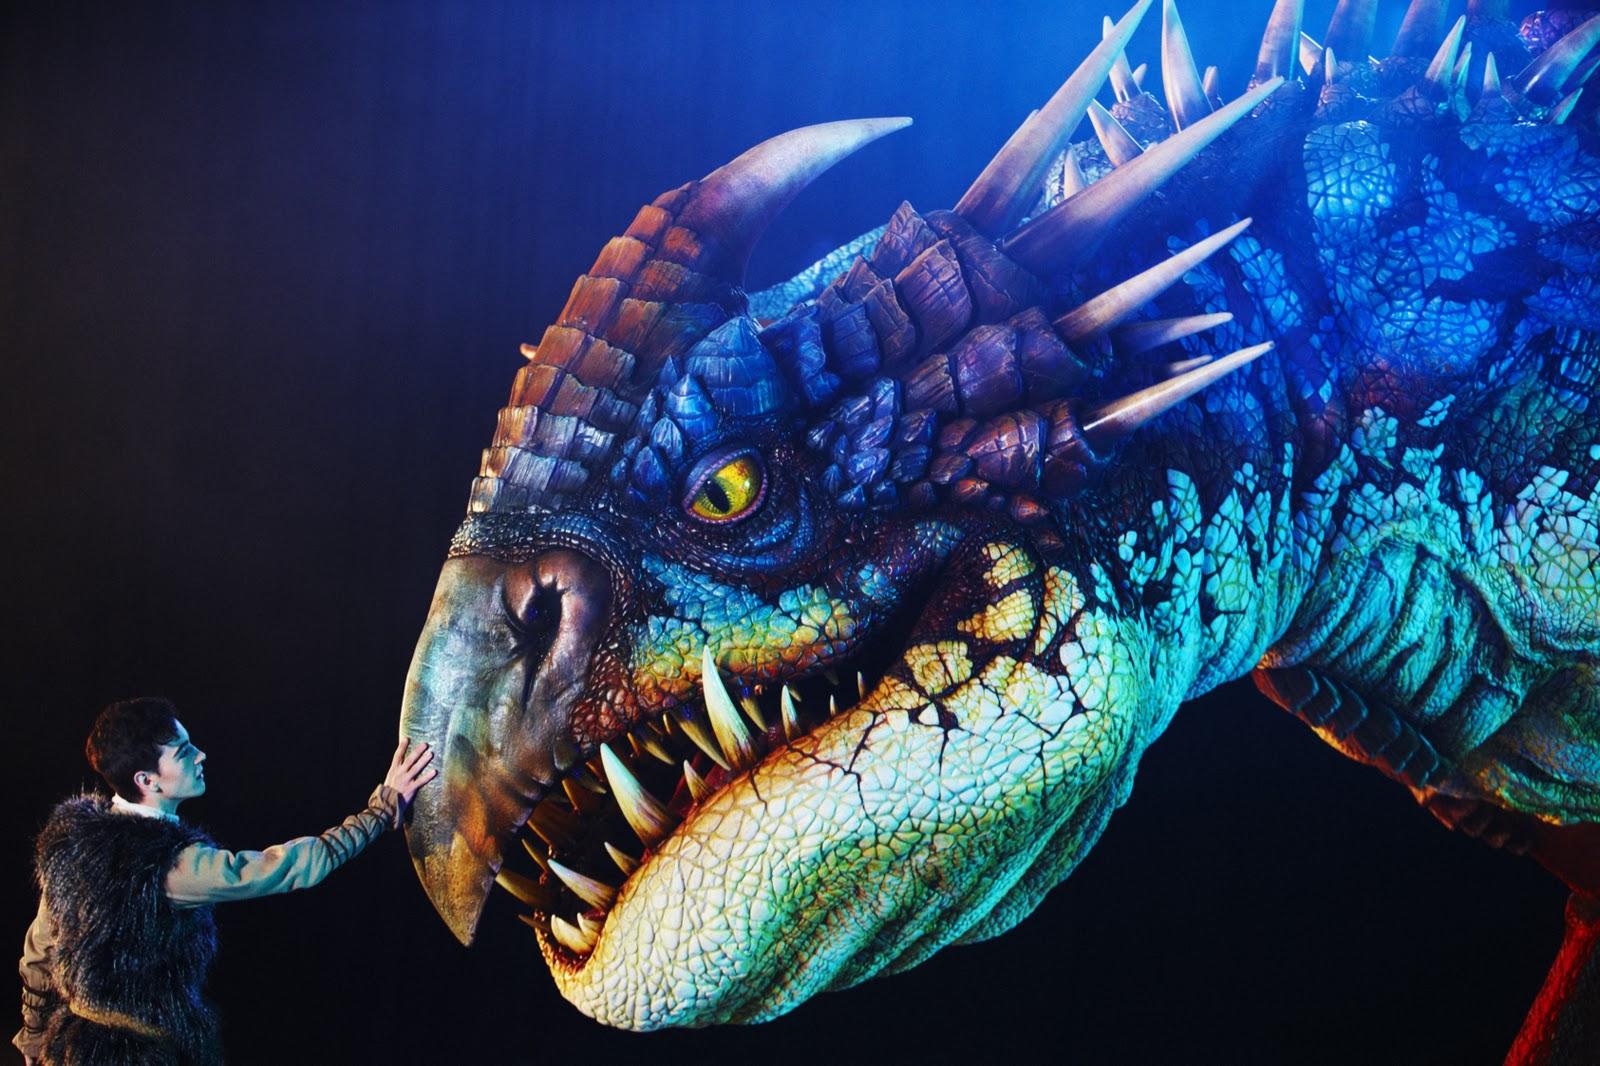 ChiIL Mama Dragons And Drama DreamworksOh My